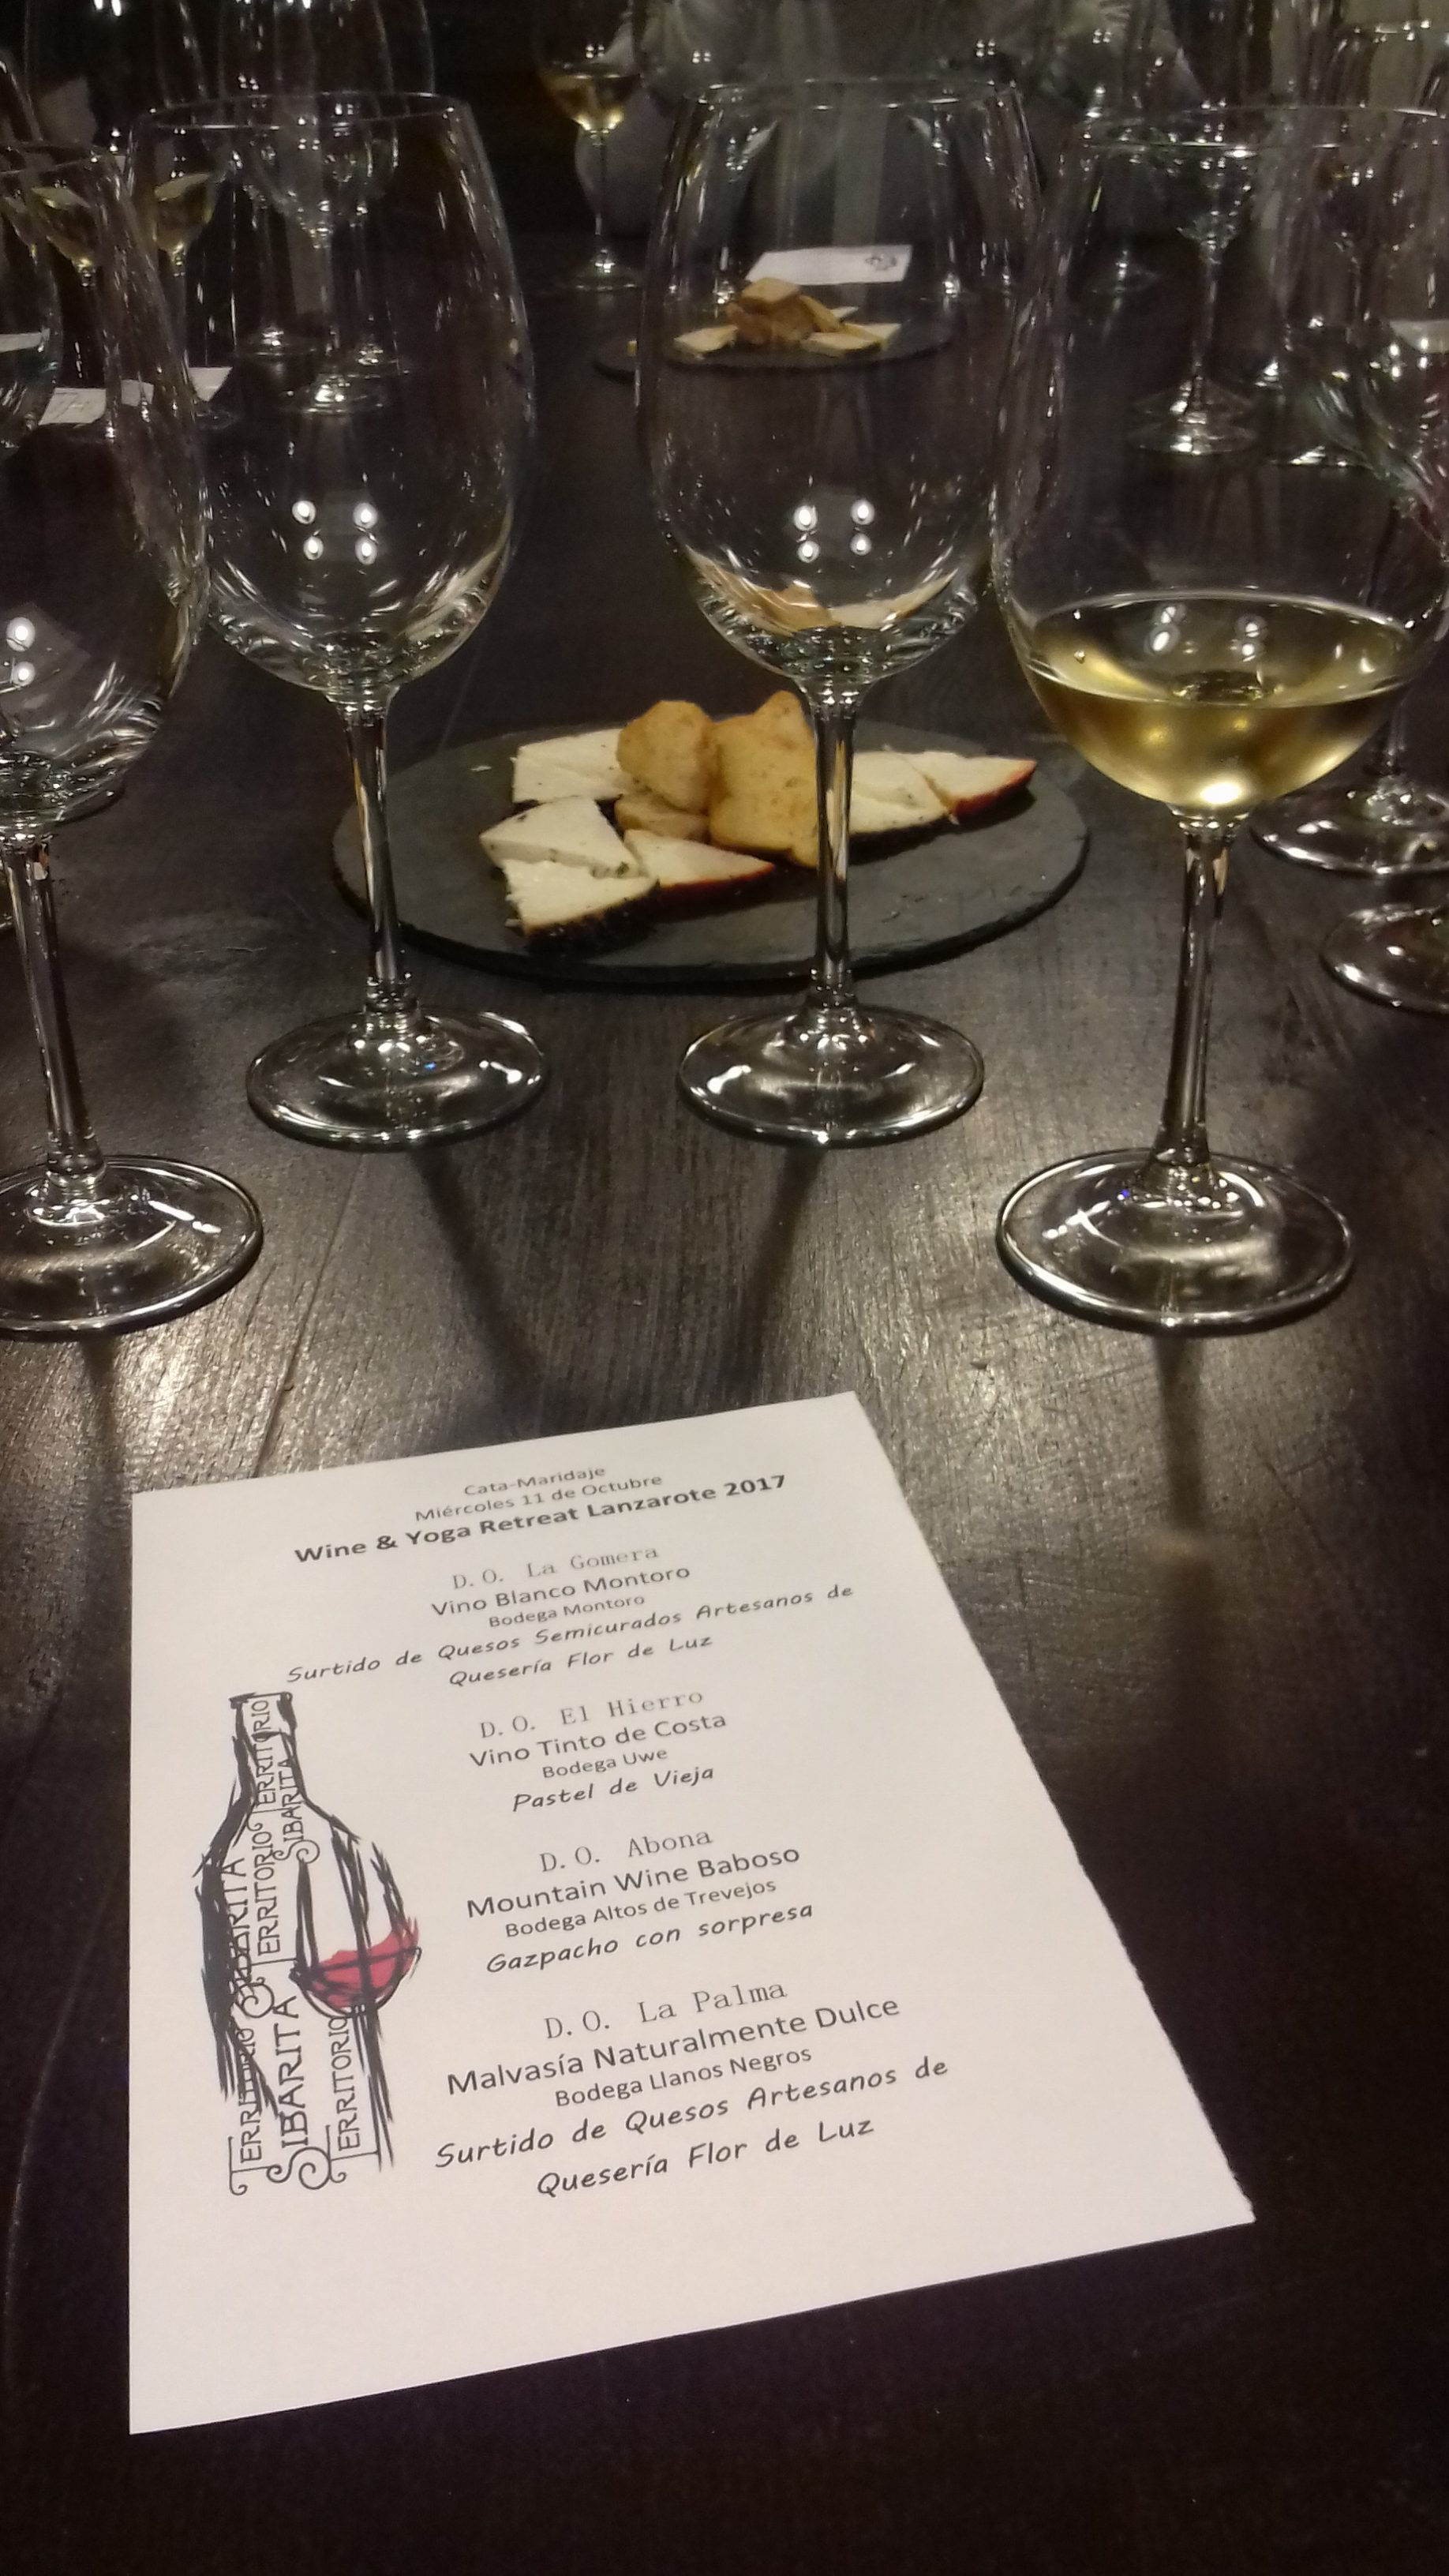 Yoga wine retreat 2017 marta molinera for Yoga and wine retreat